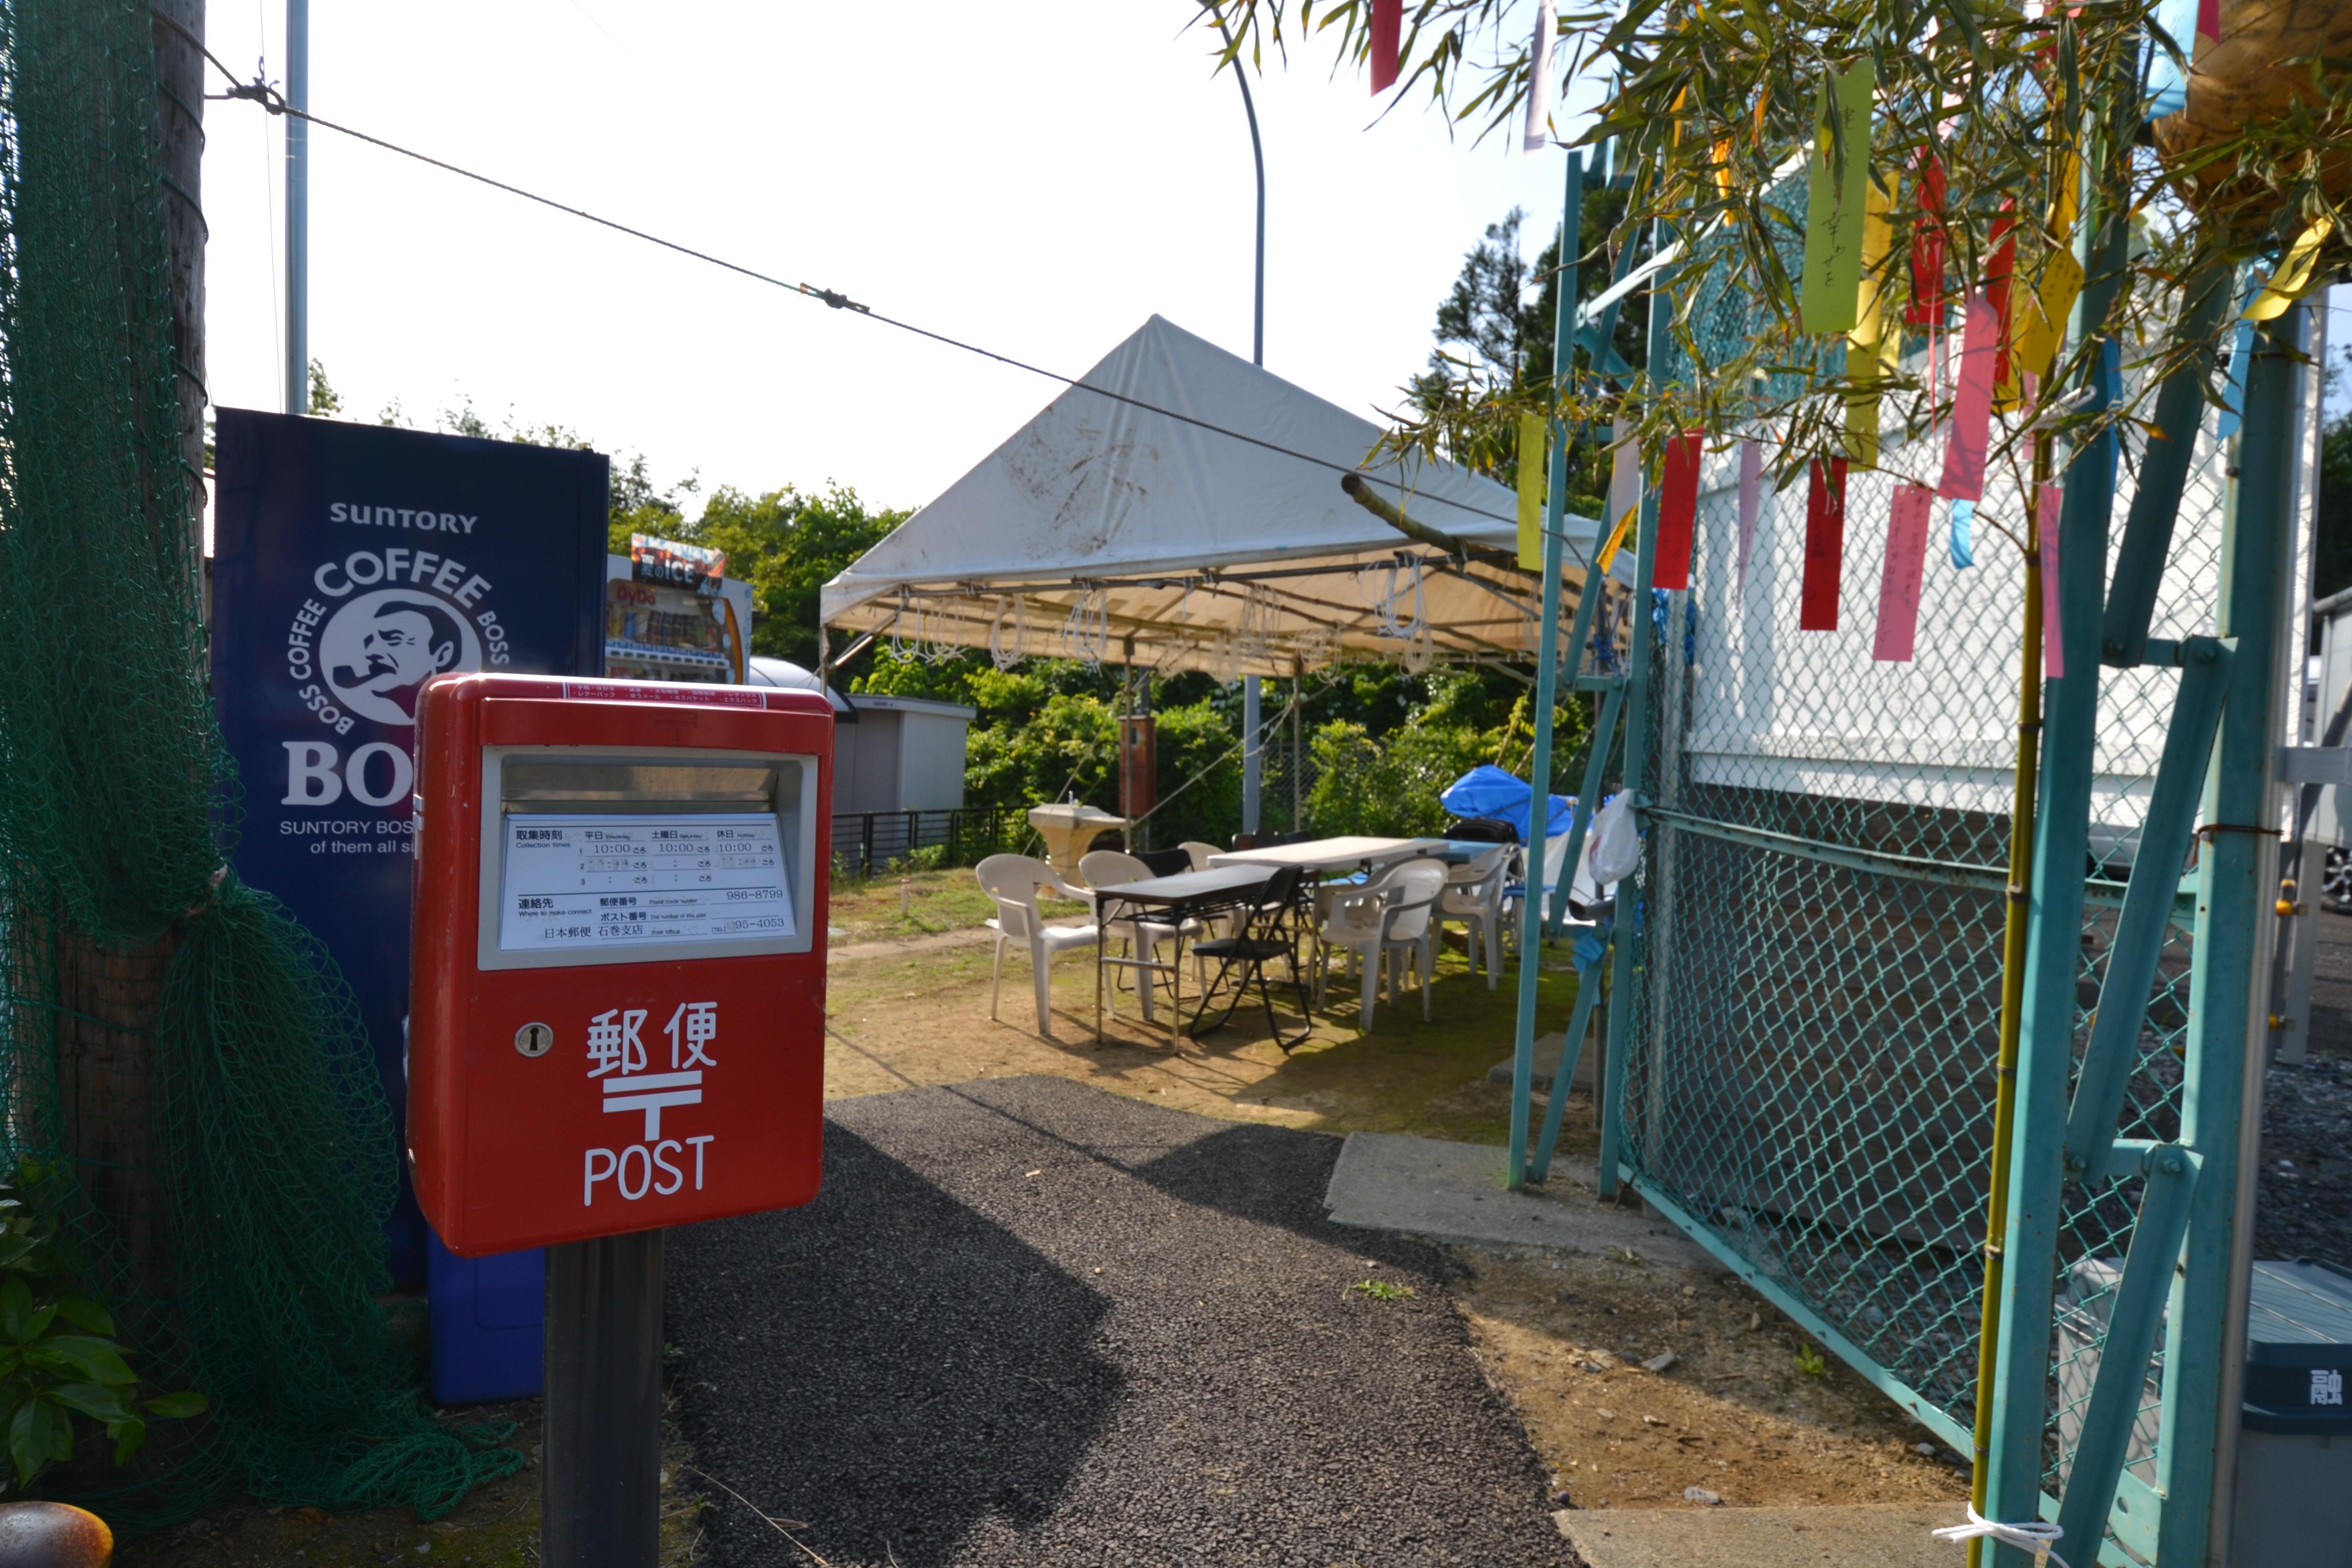 naburi temp housing post office and social gathering spot with tanabata decorations.JPG